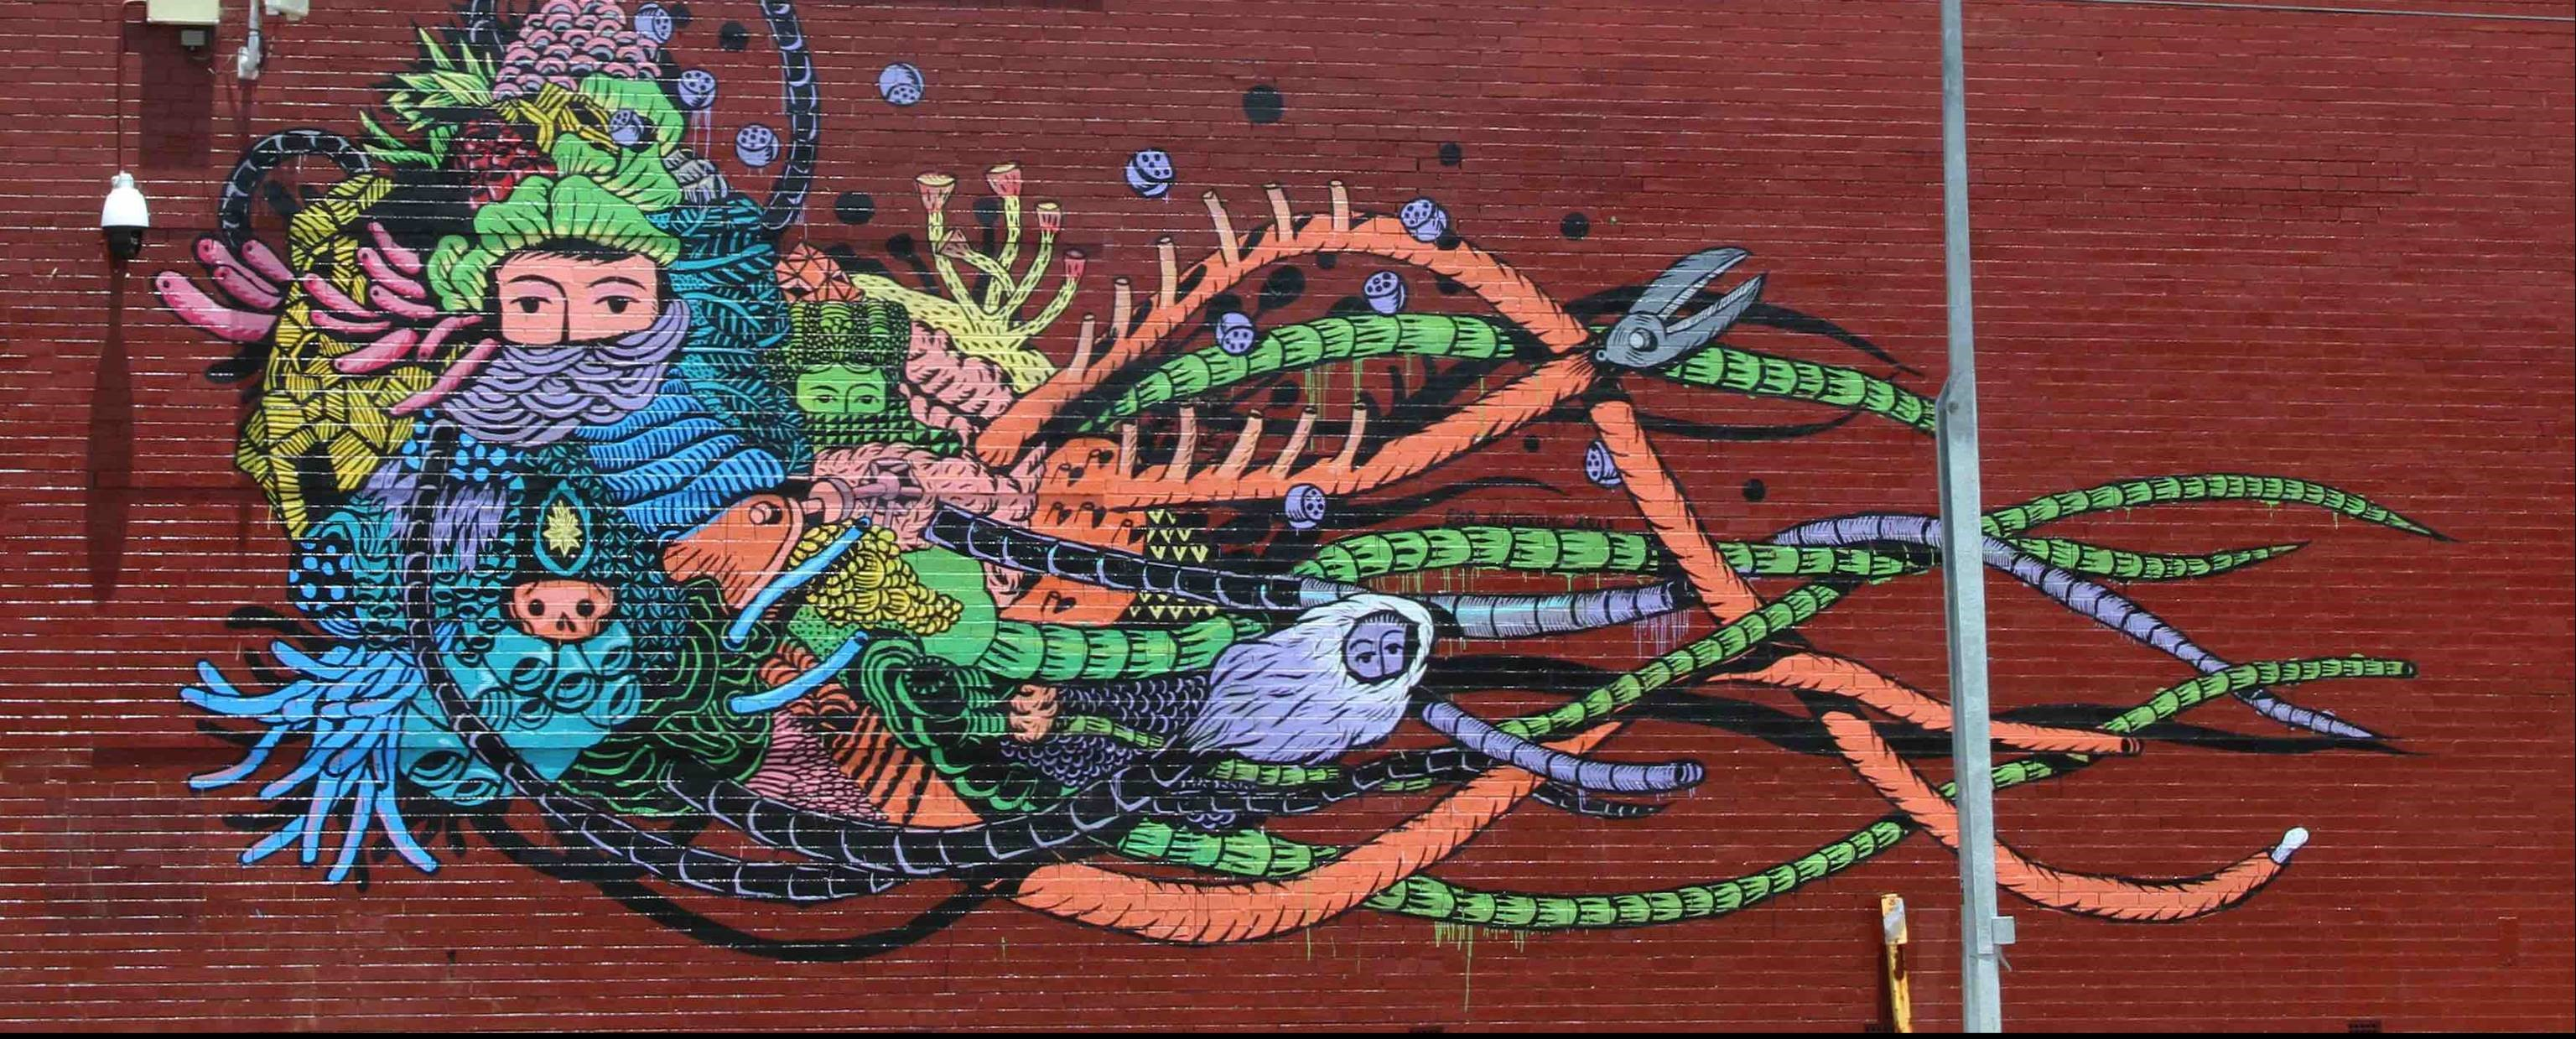 A work by Indonesian artist Eko Nugroho (Photo: Stu Rapley/Flickr)